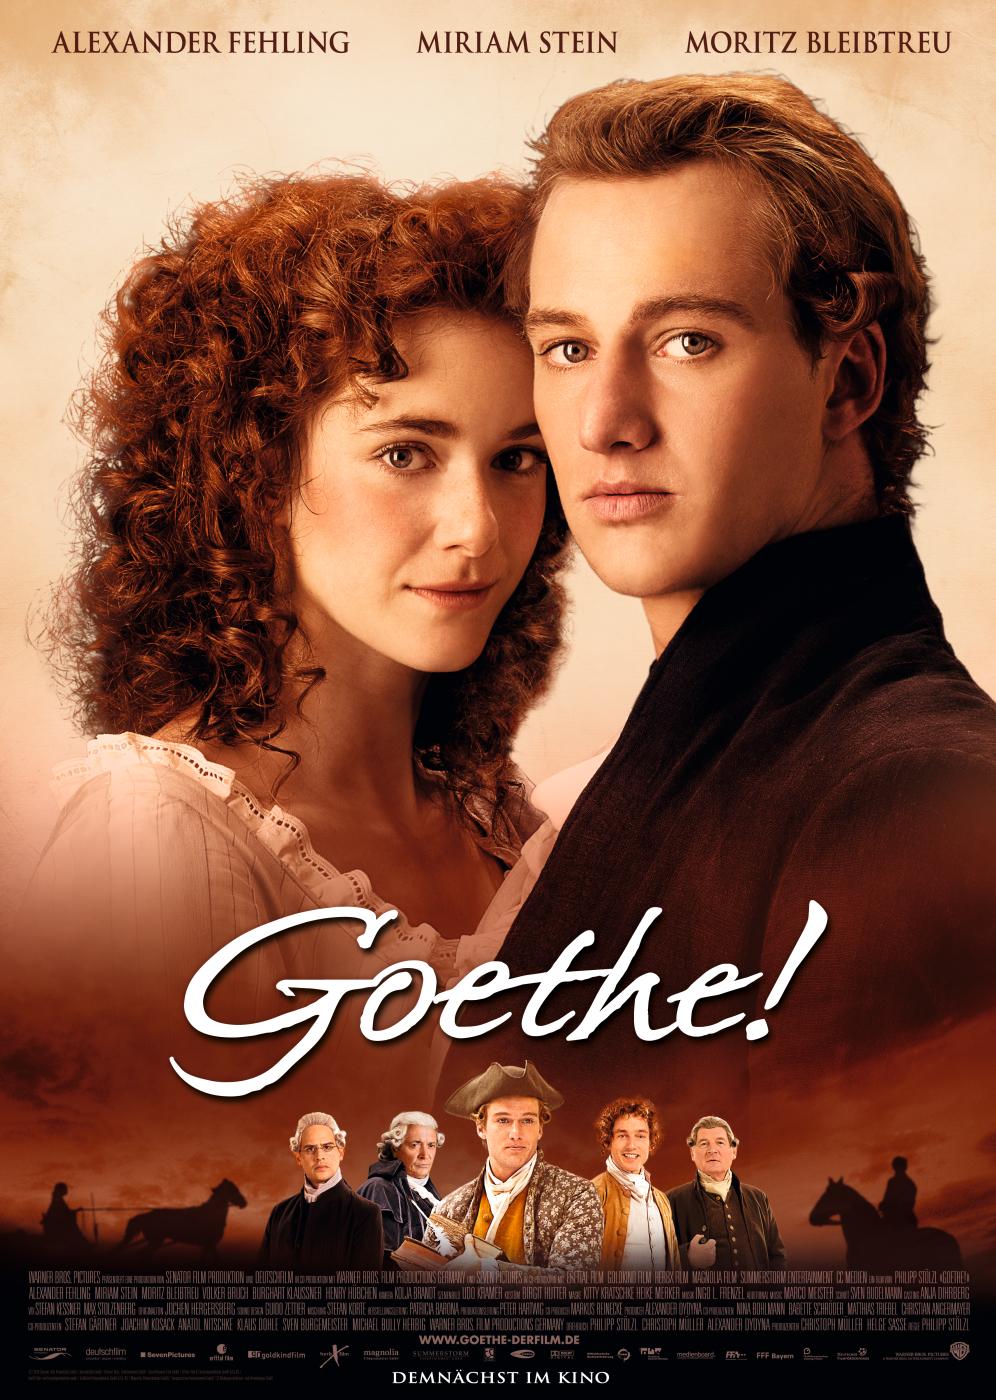 goethe! 2010